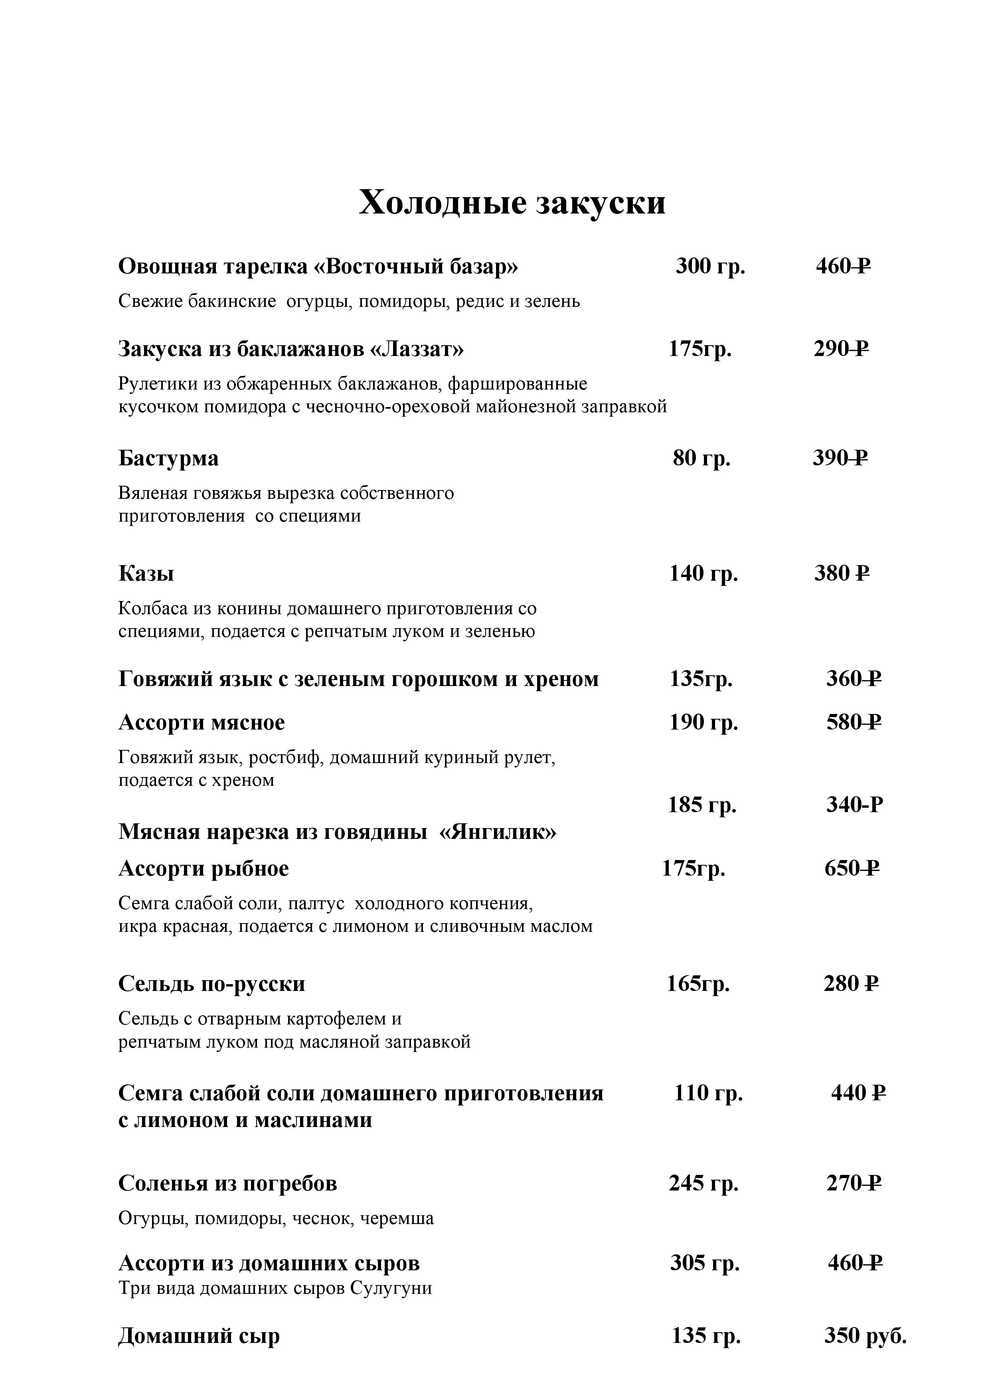 Меню ресторана Навруз на Ленинском проспекте фото 2